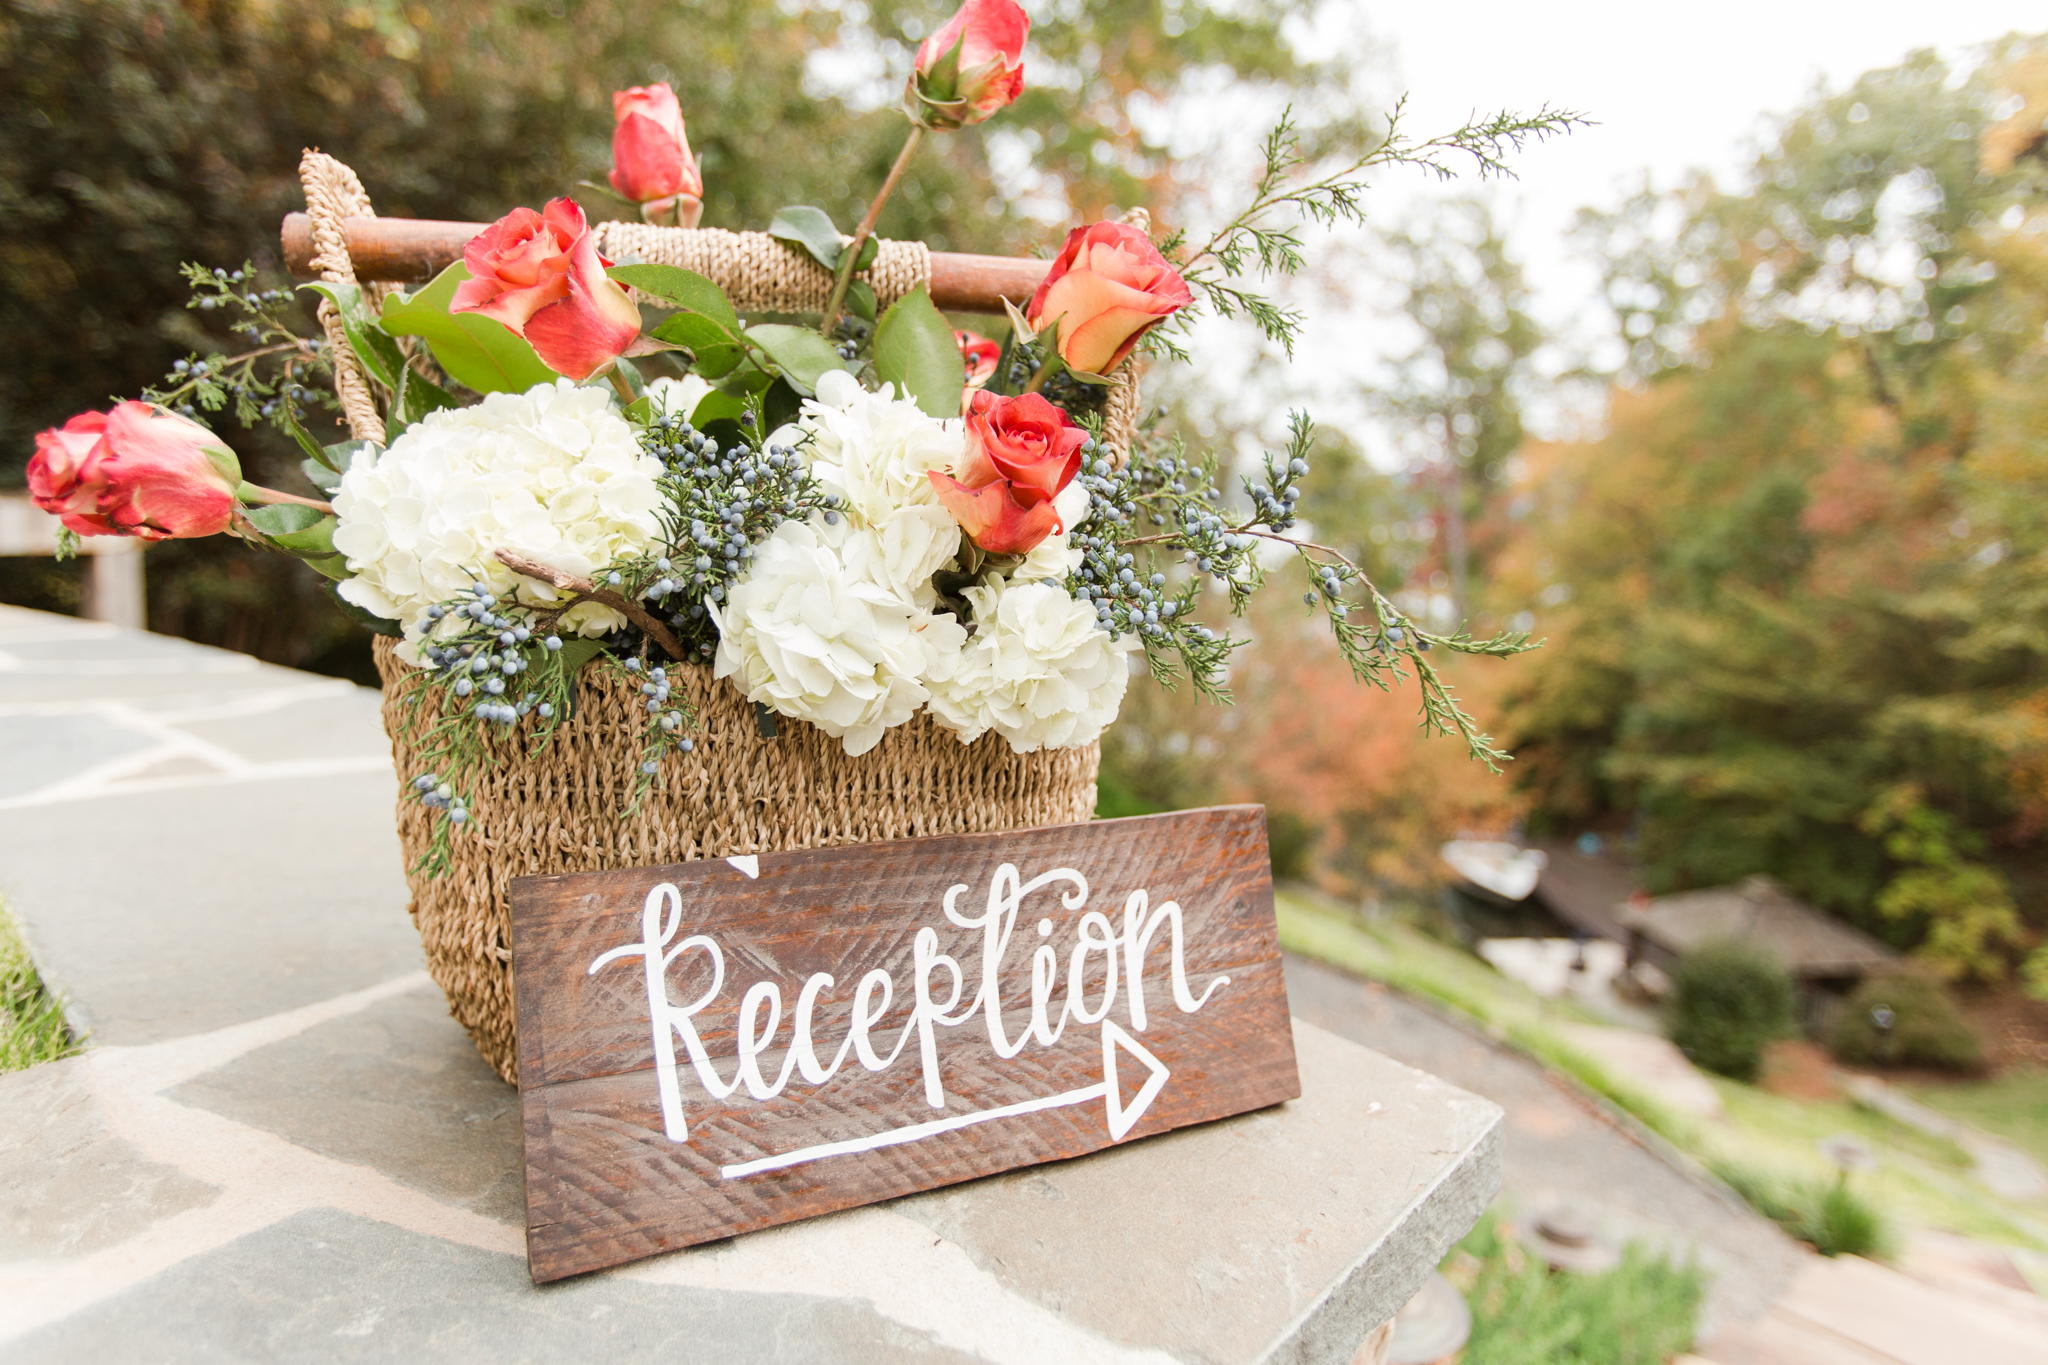 Ashley-Amber-Photo-Outdoor-Wedding-Photography-142438.jpg